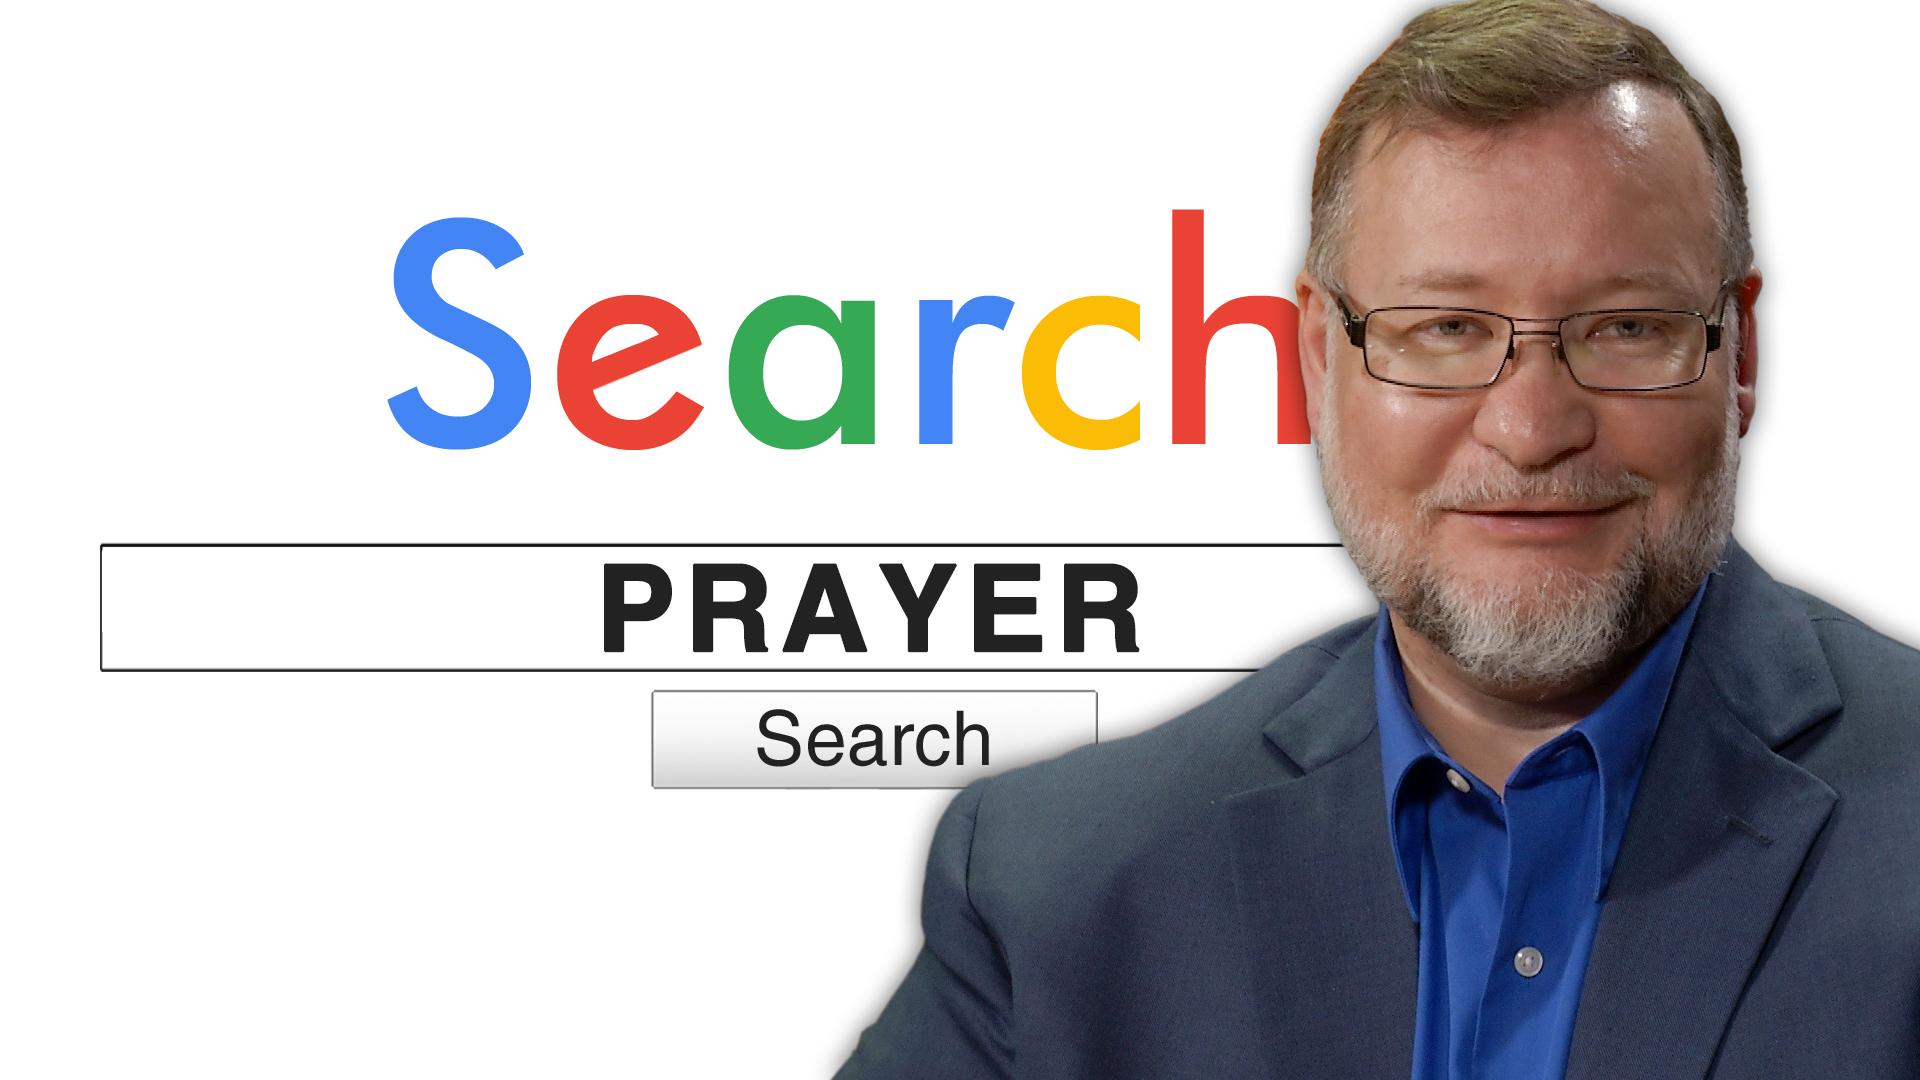 Search Prayer